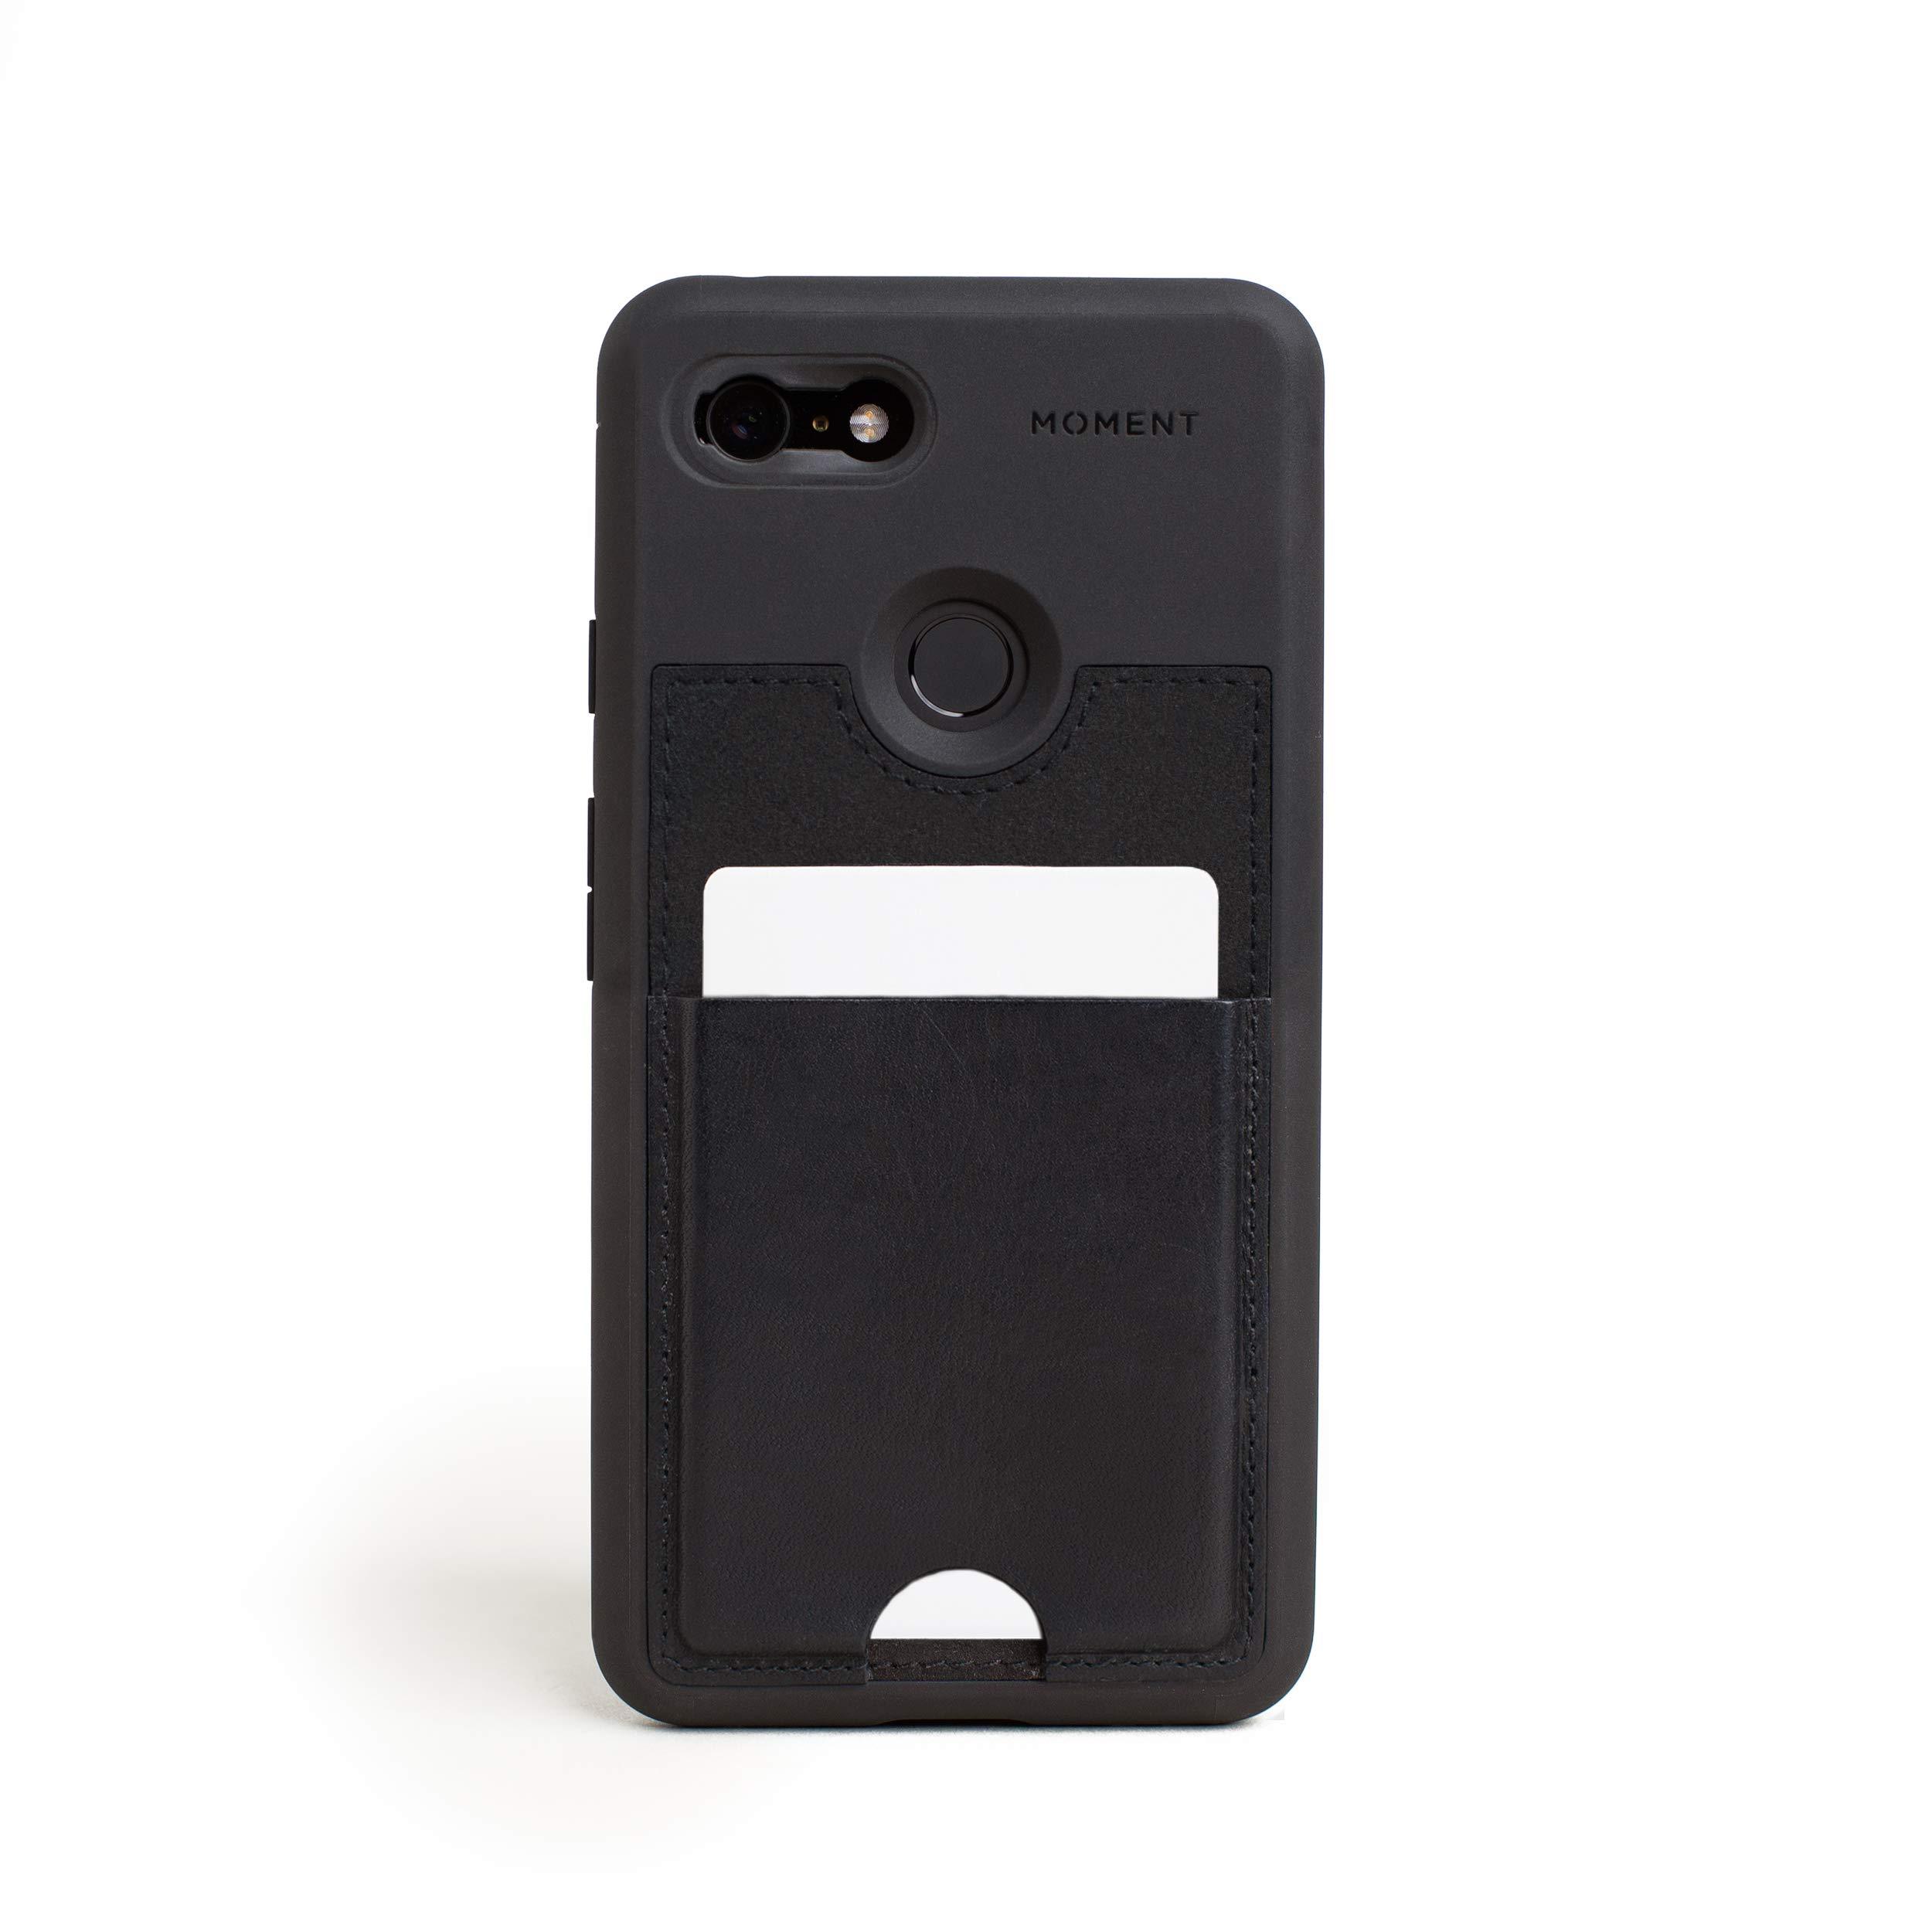 ویکالا · خرید  اصل اورجینال · خرید از آمازون · Pixel 3 XL Wallet Case    Moment Photo Case in Black Leather - Thin, Protective, Wrist Strap Friendly Wallet case for Camera Lovers. wekala · ویکالا